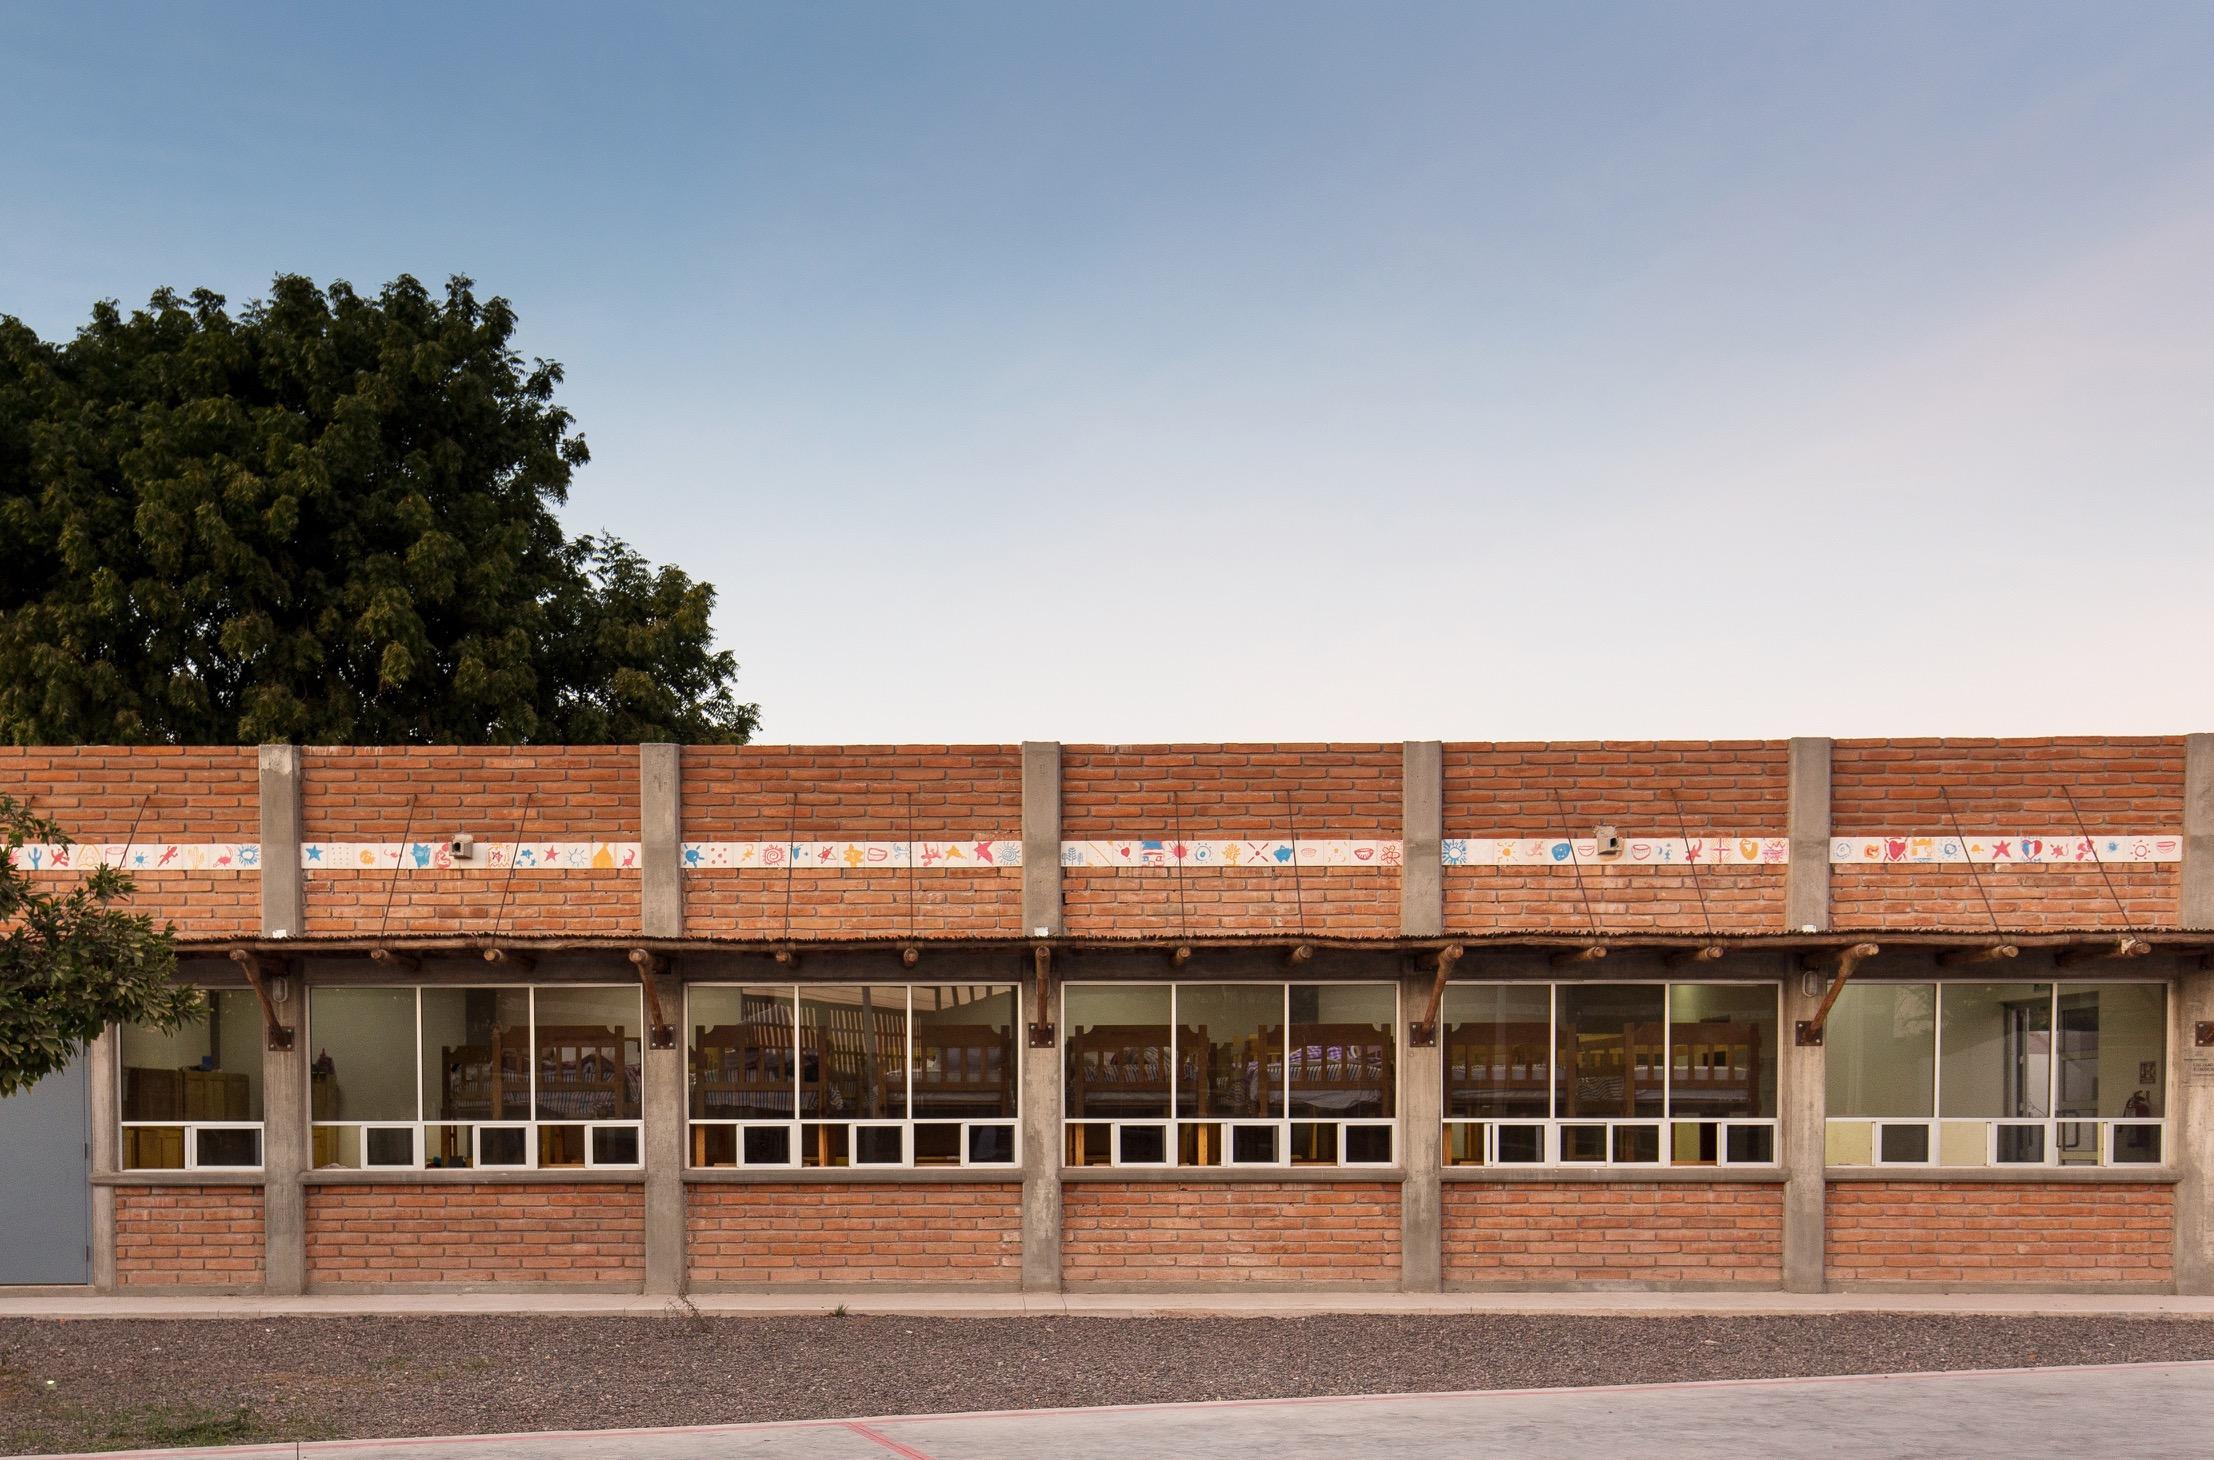 Mención Honorífica categoría Educación en la XV Bienal Nacional e Internacional de Arquitectura Mexicana 2018 -